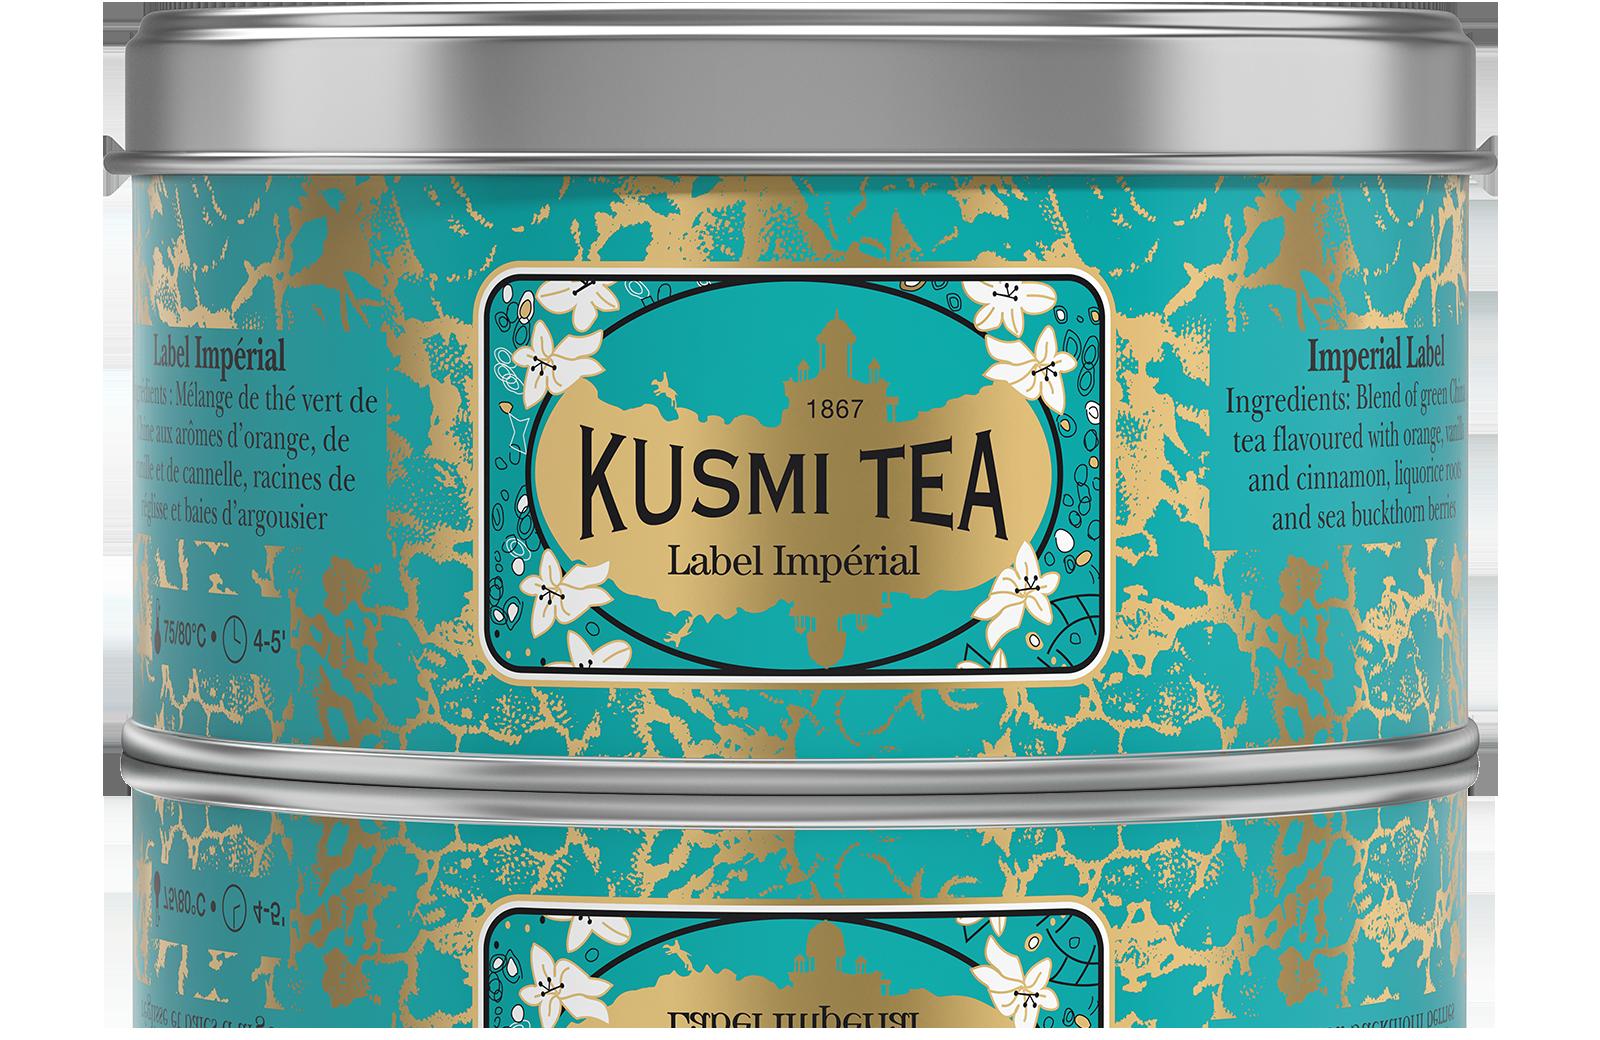 Thé vert - Label Impérial - Vrac - Kusmi Tea